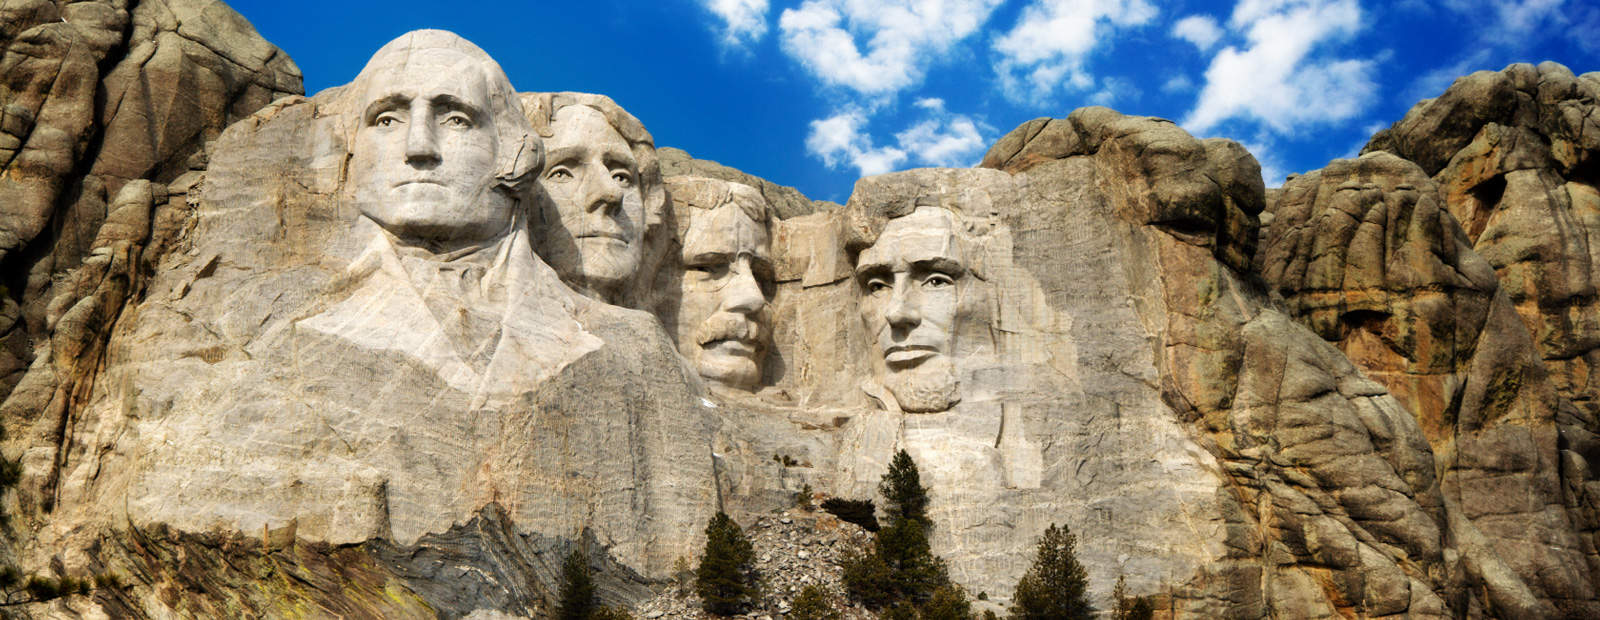 Mount Rushmore – famous sculpture